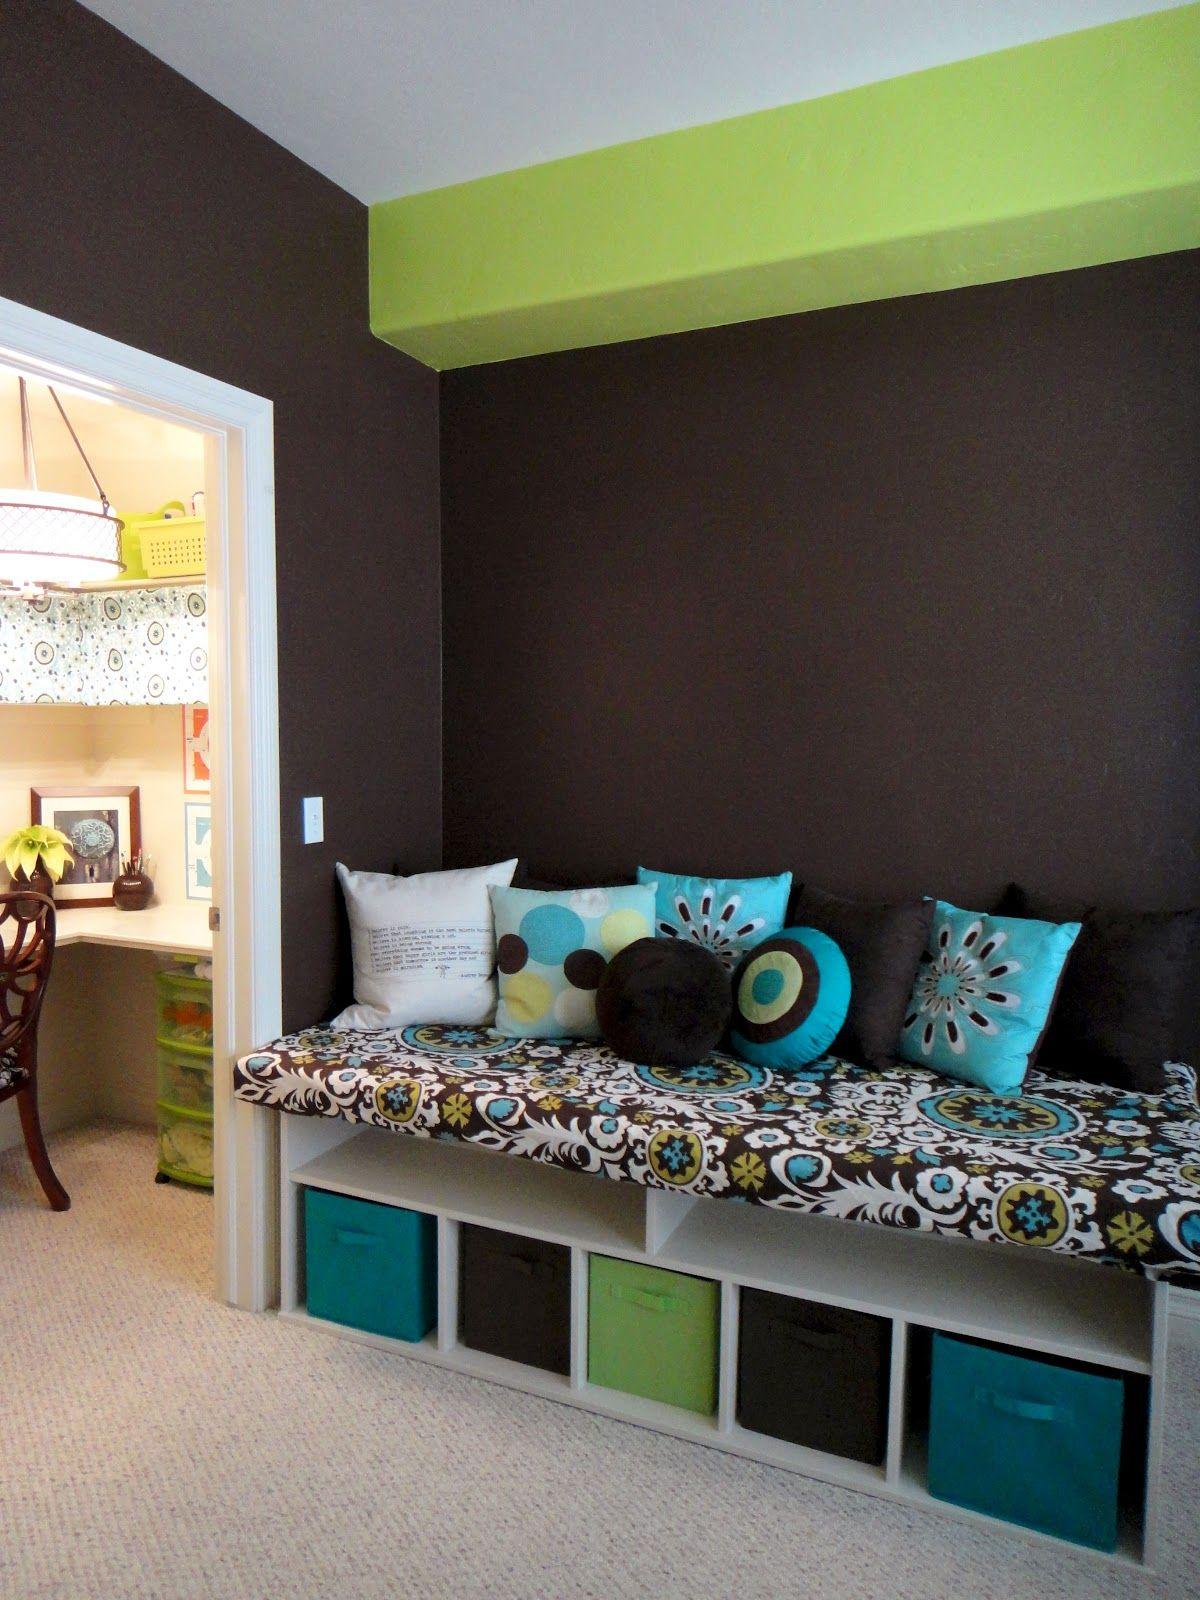 Playroom Storage Solution Playroom Storage Storage Solutions Diy Home Decor